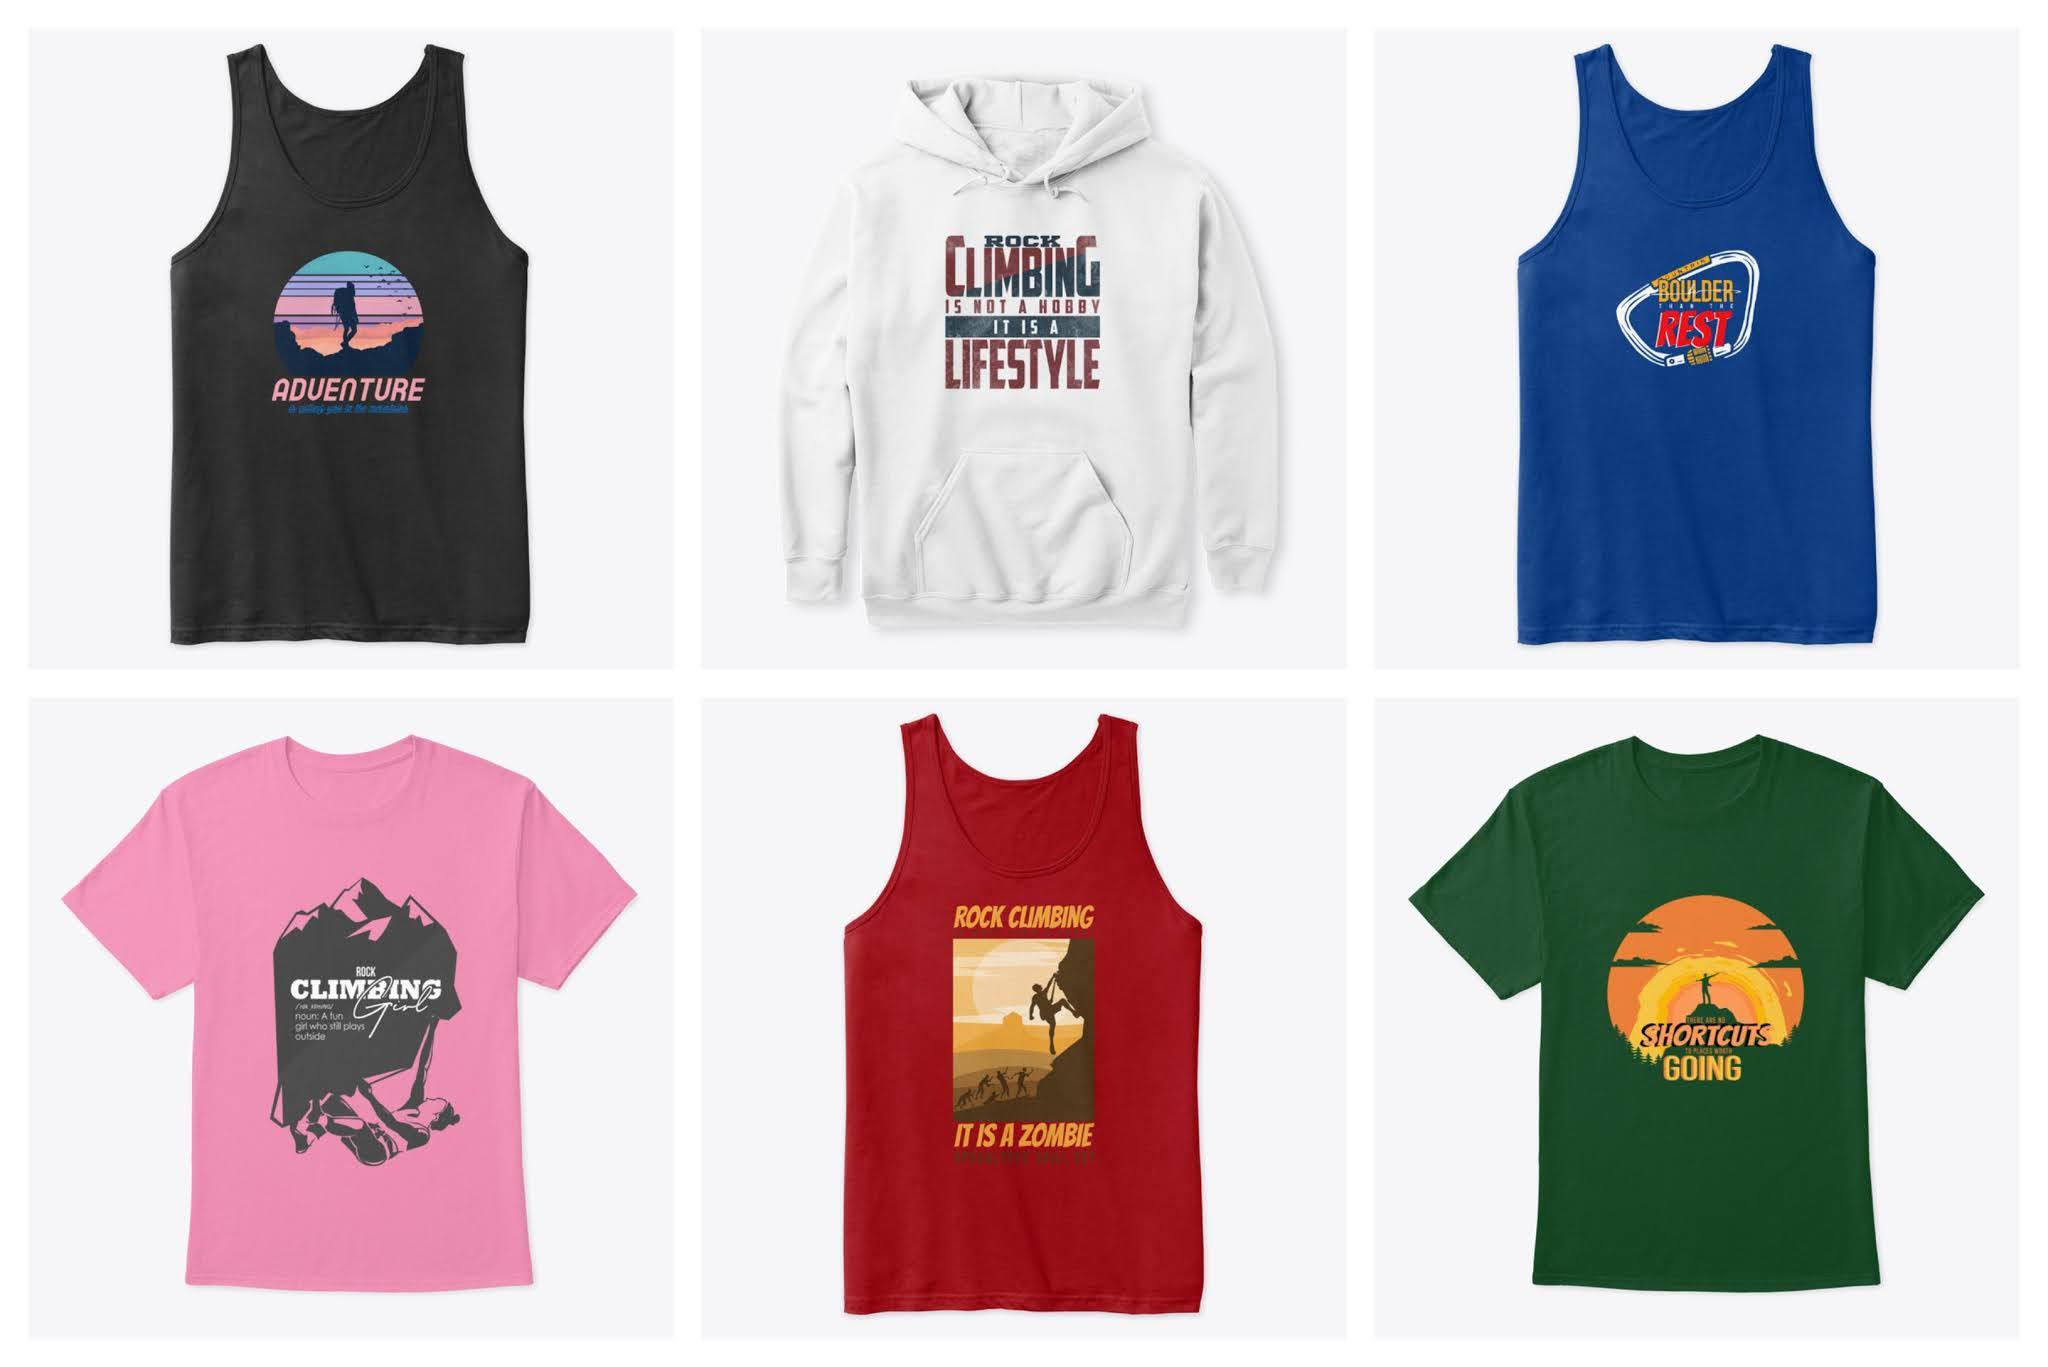 unisex rock climbing apparel for women and men